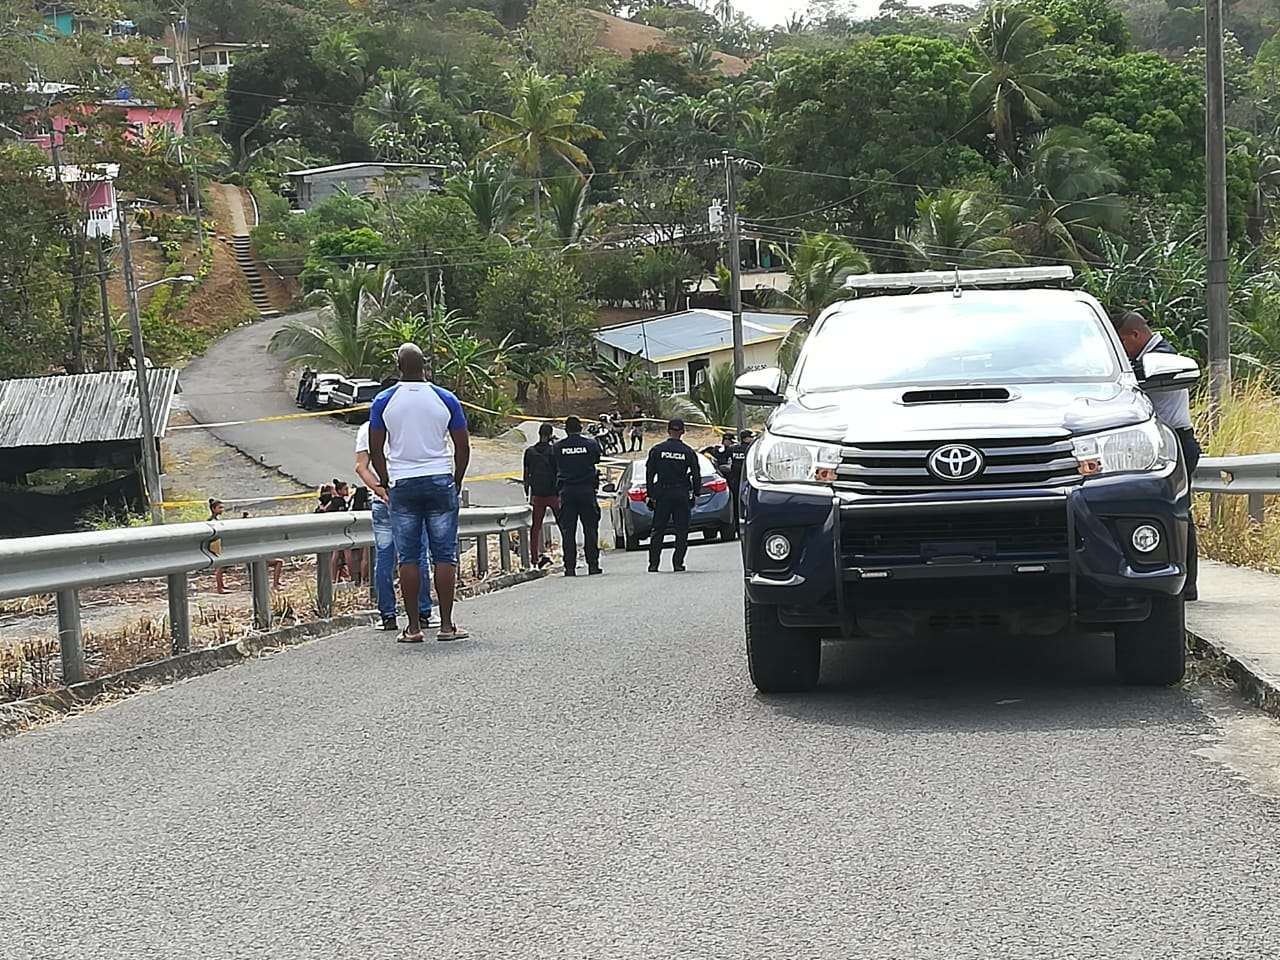 Vista general de la escena del crimen en Cativá. Foto: Diómedes Sánchez